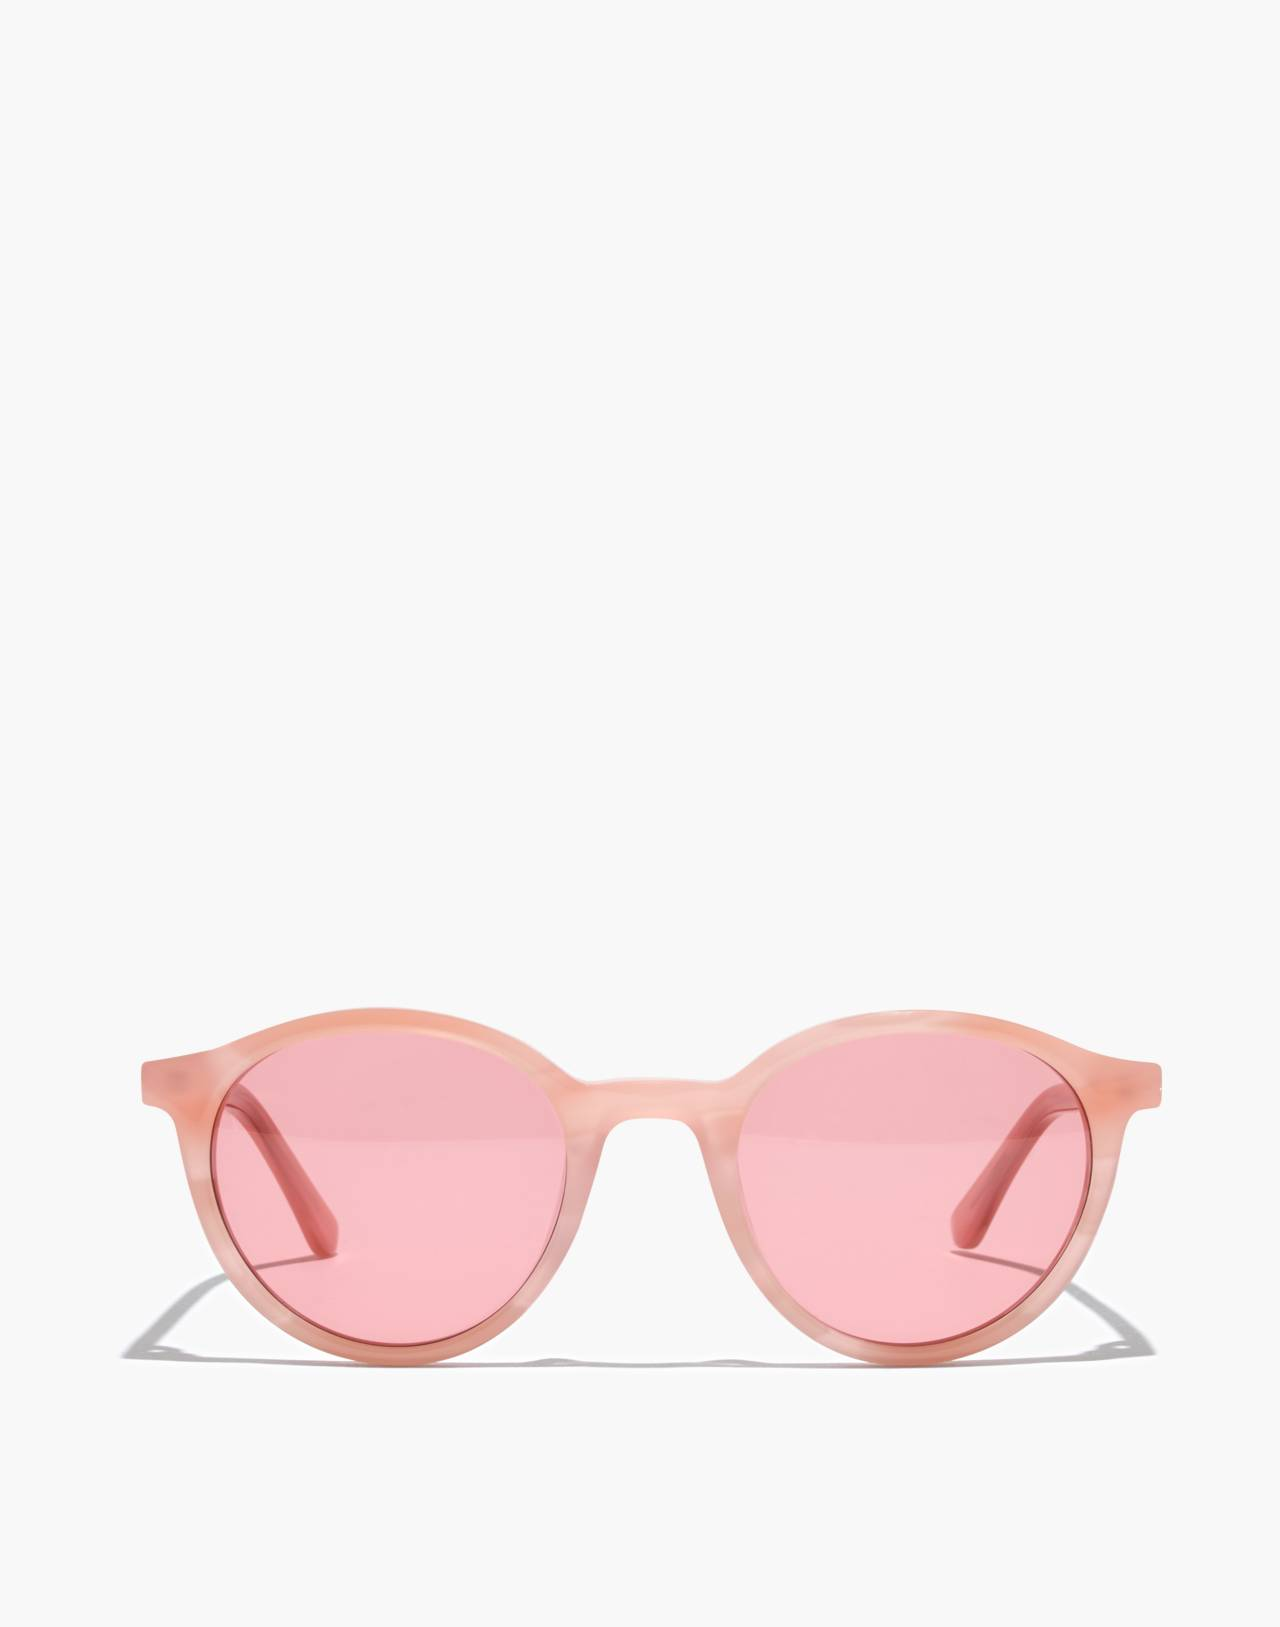 Layton Sunglasses in sweetheart blush image 1